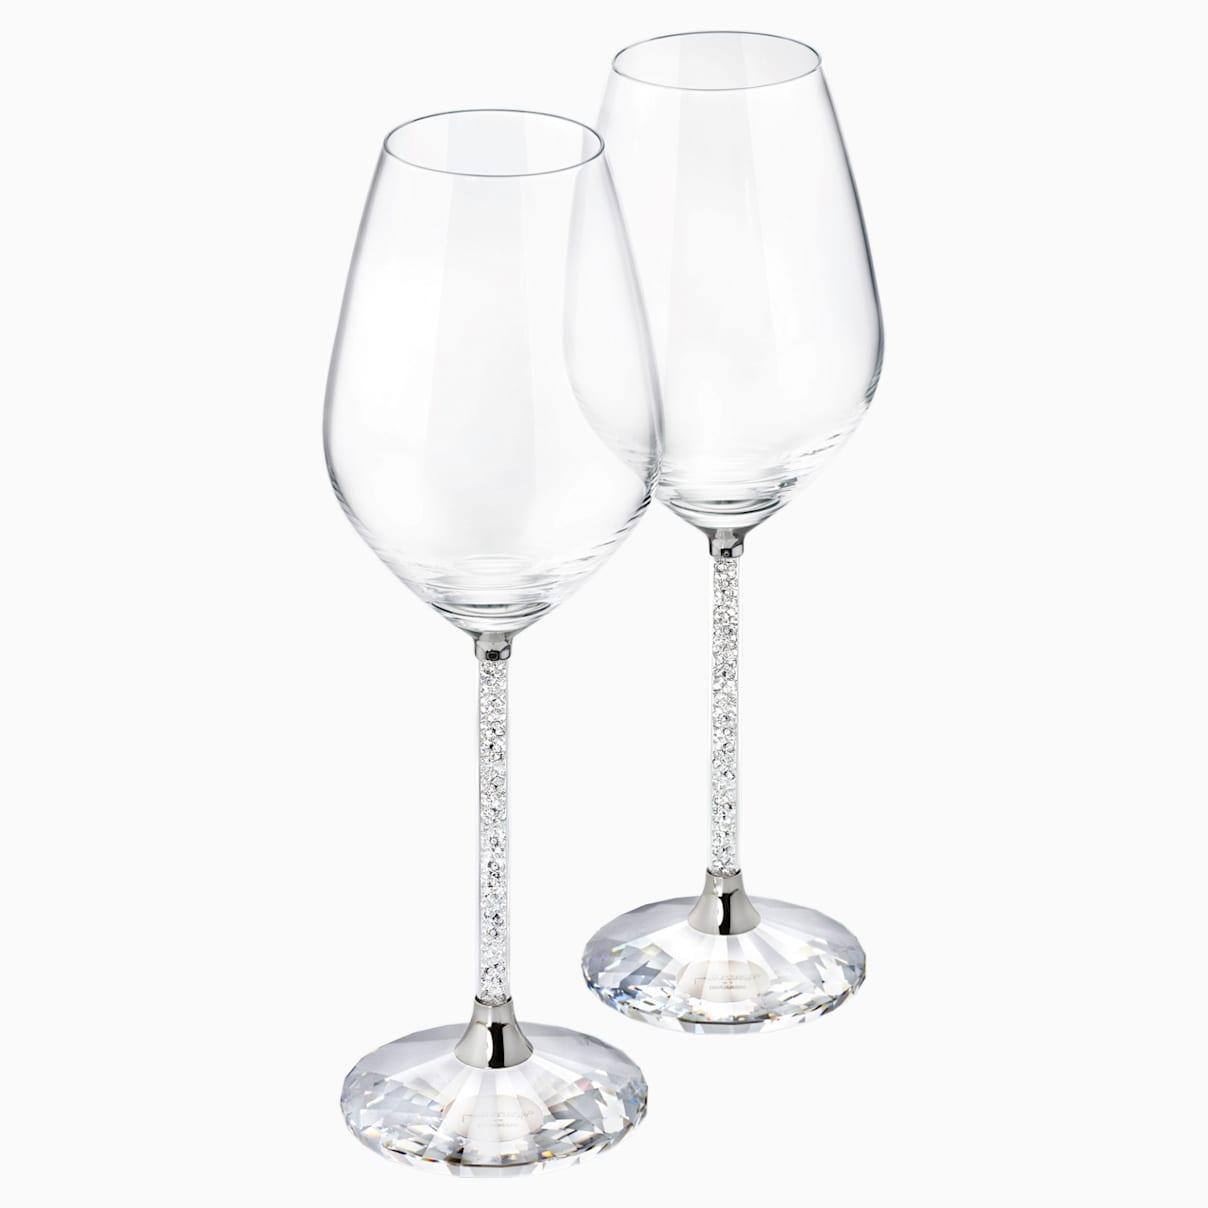 Verres à vin crystalline set de 2